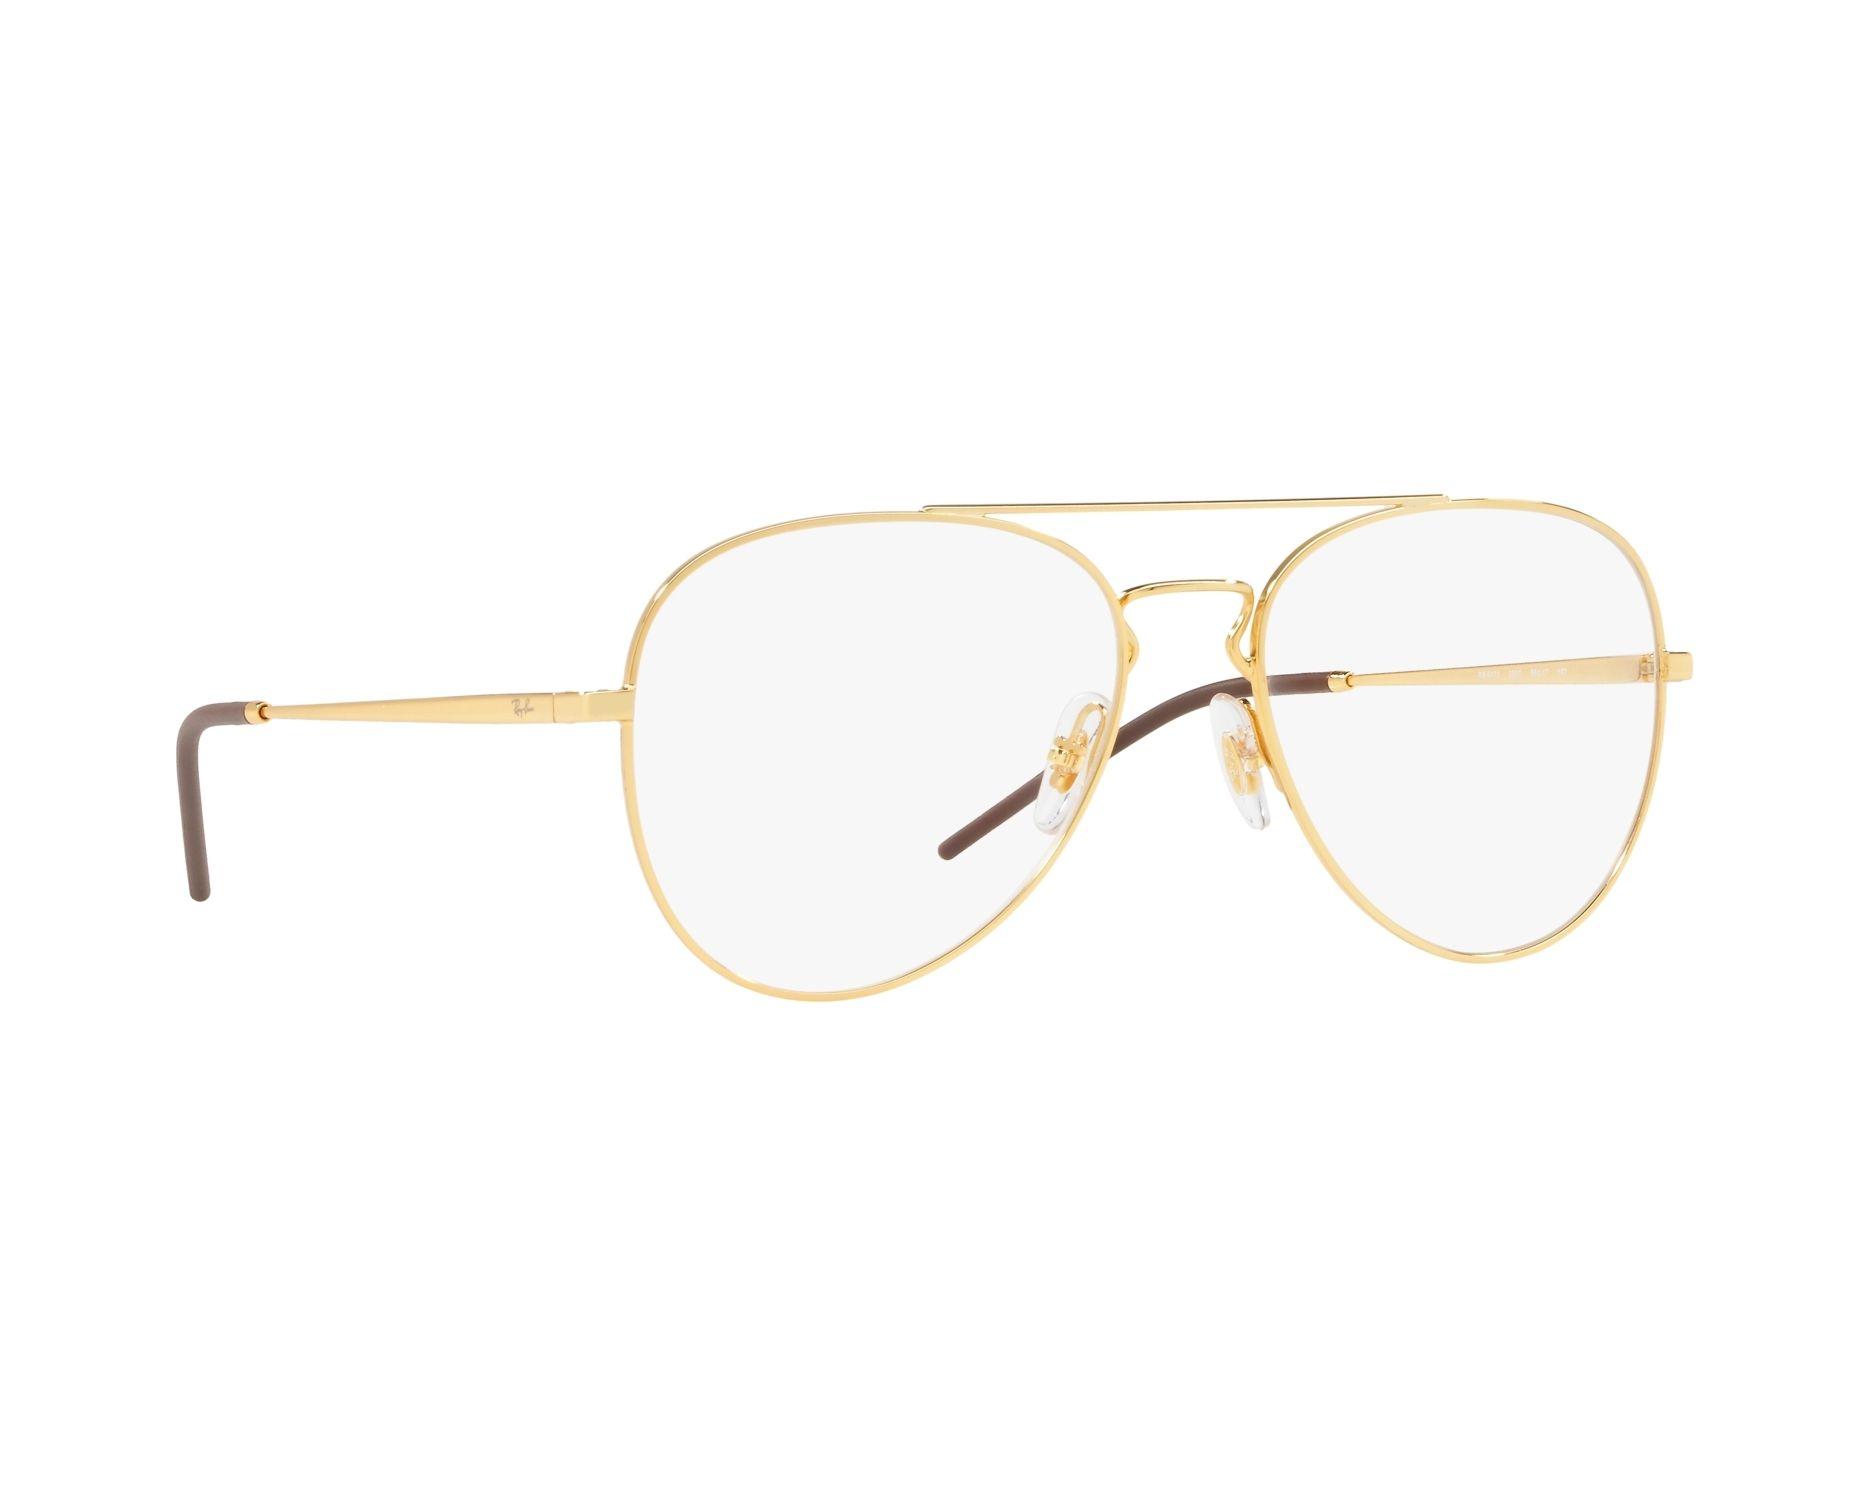 31605698164 eyeglasses Ray-Ban RX-6413 2500 54-17 Gold 360 degree view 12